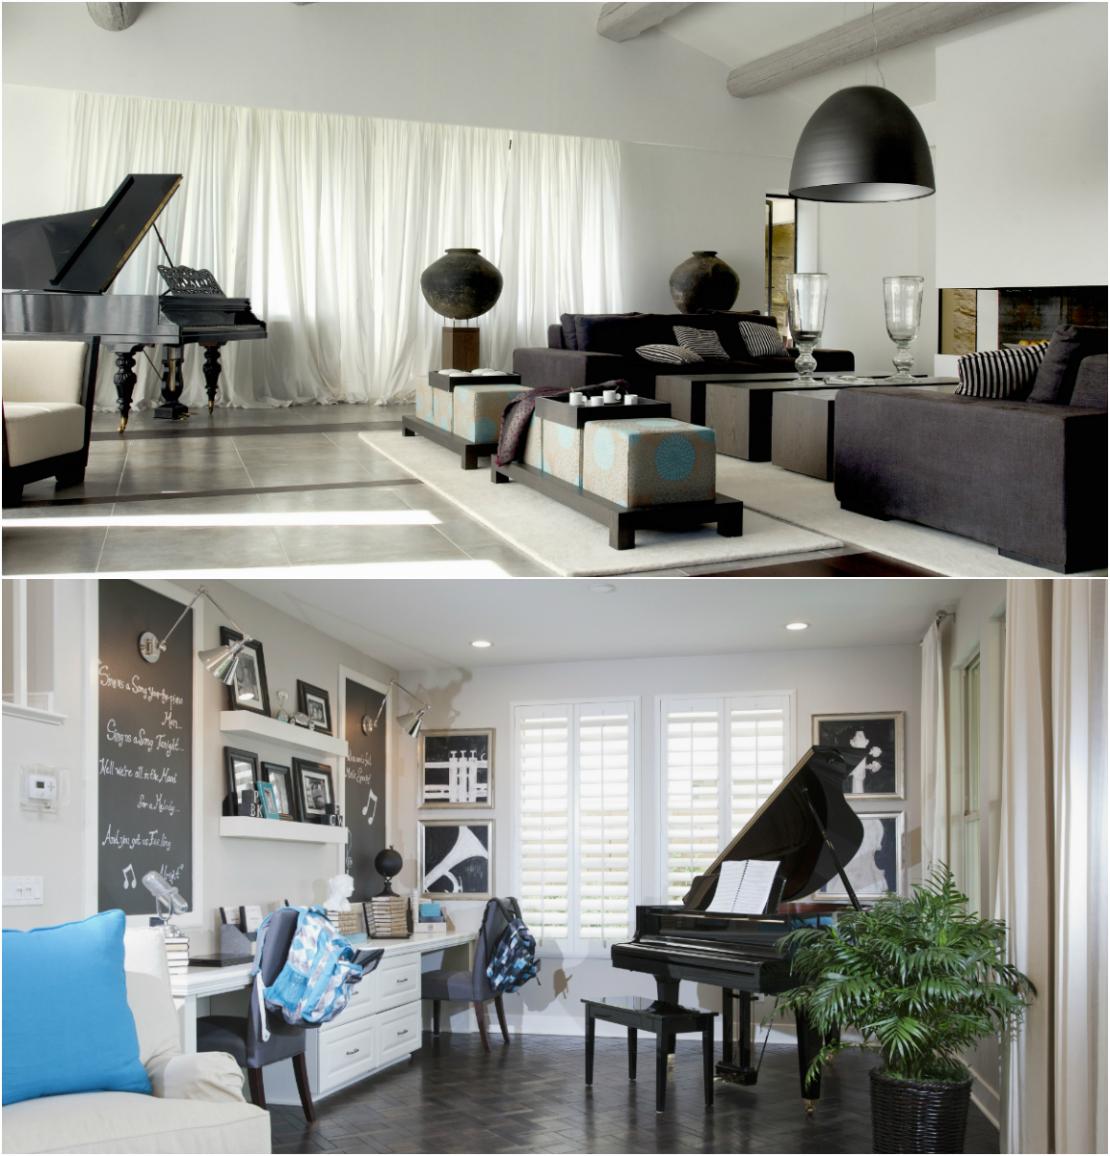 westwing-soluciones-ingeniosas-piano-collage